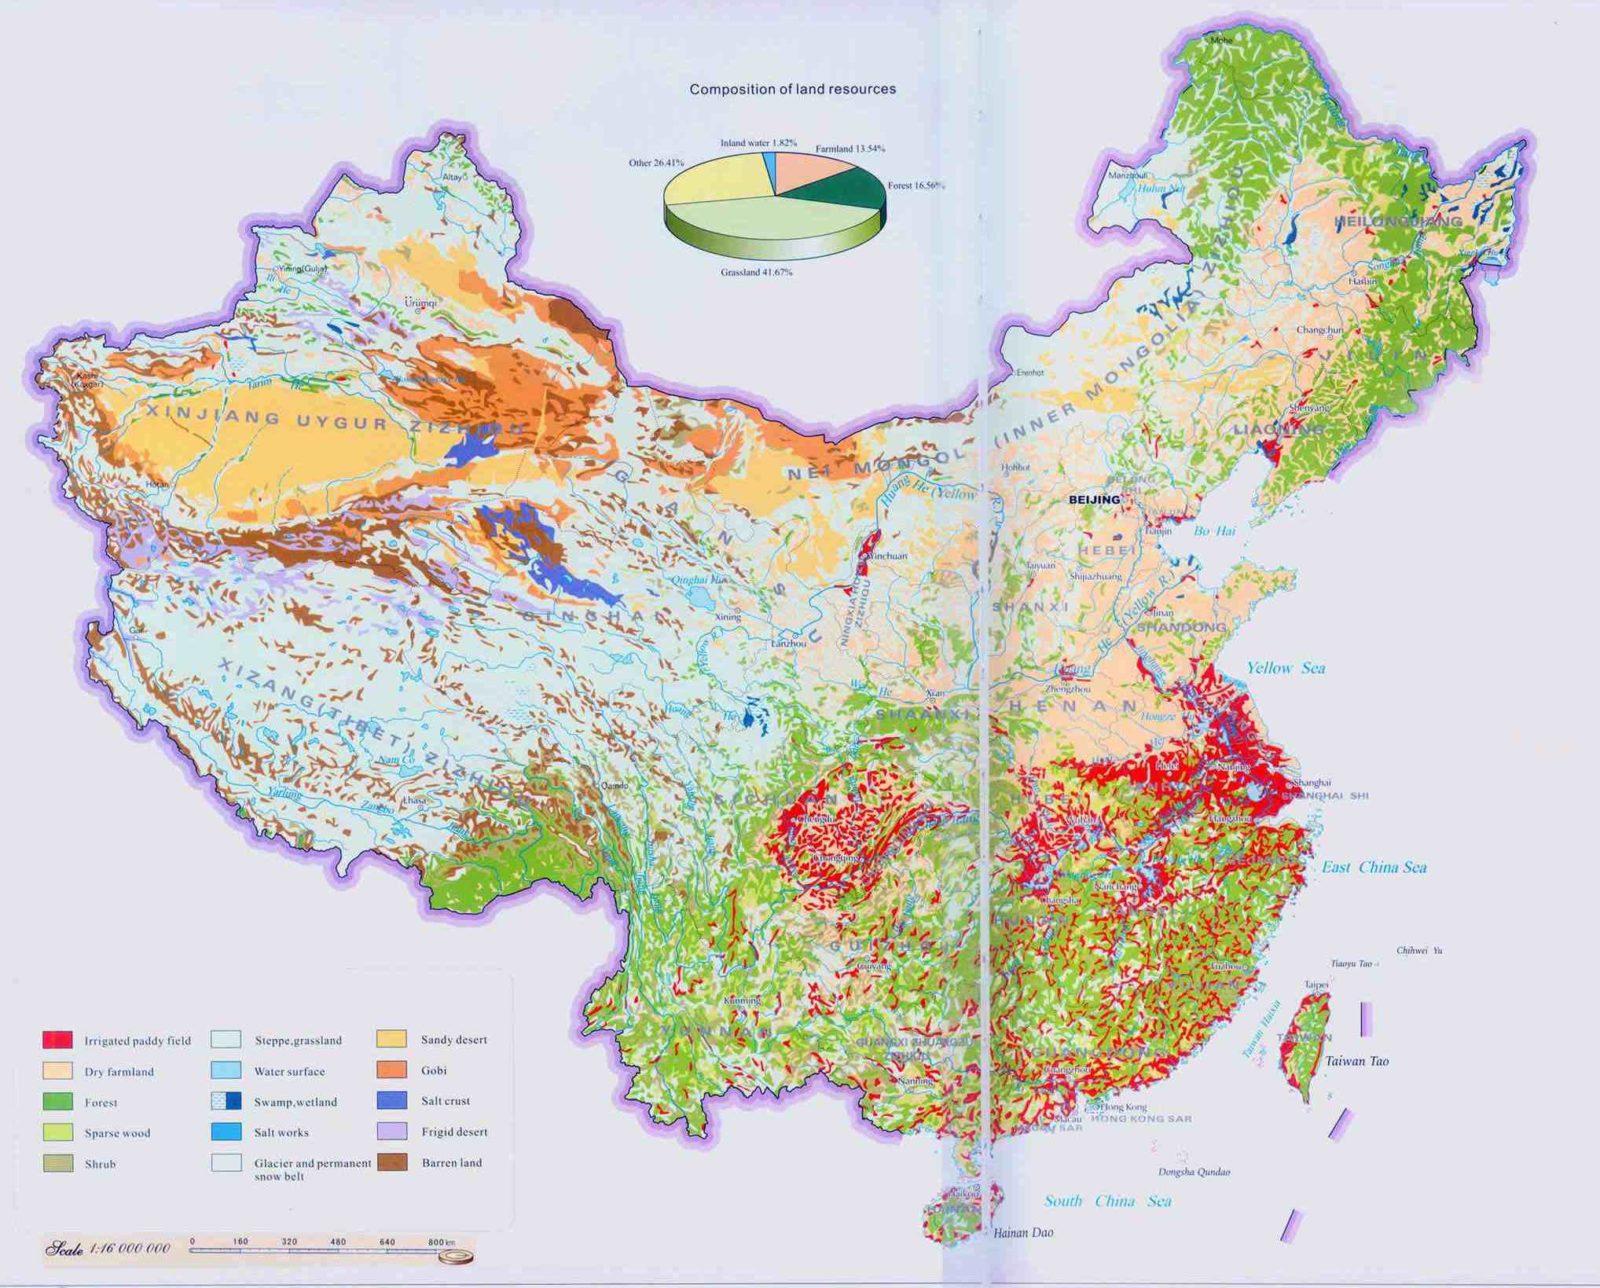 Land Composition Map